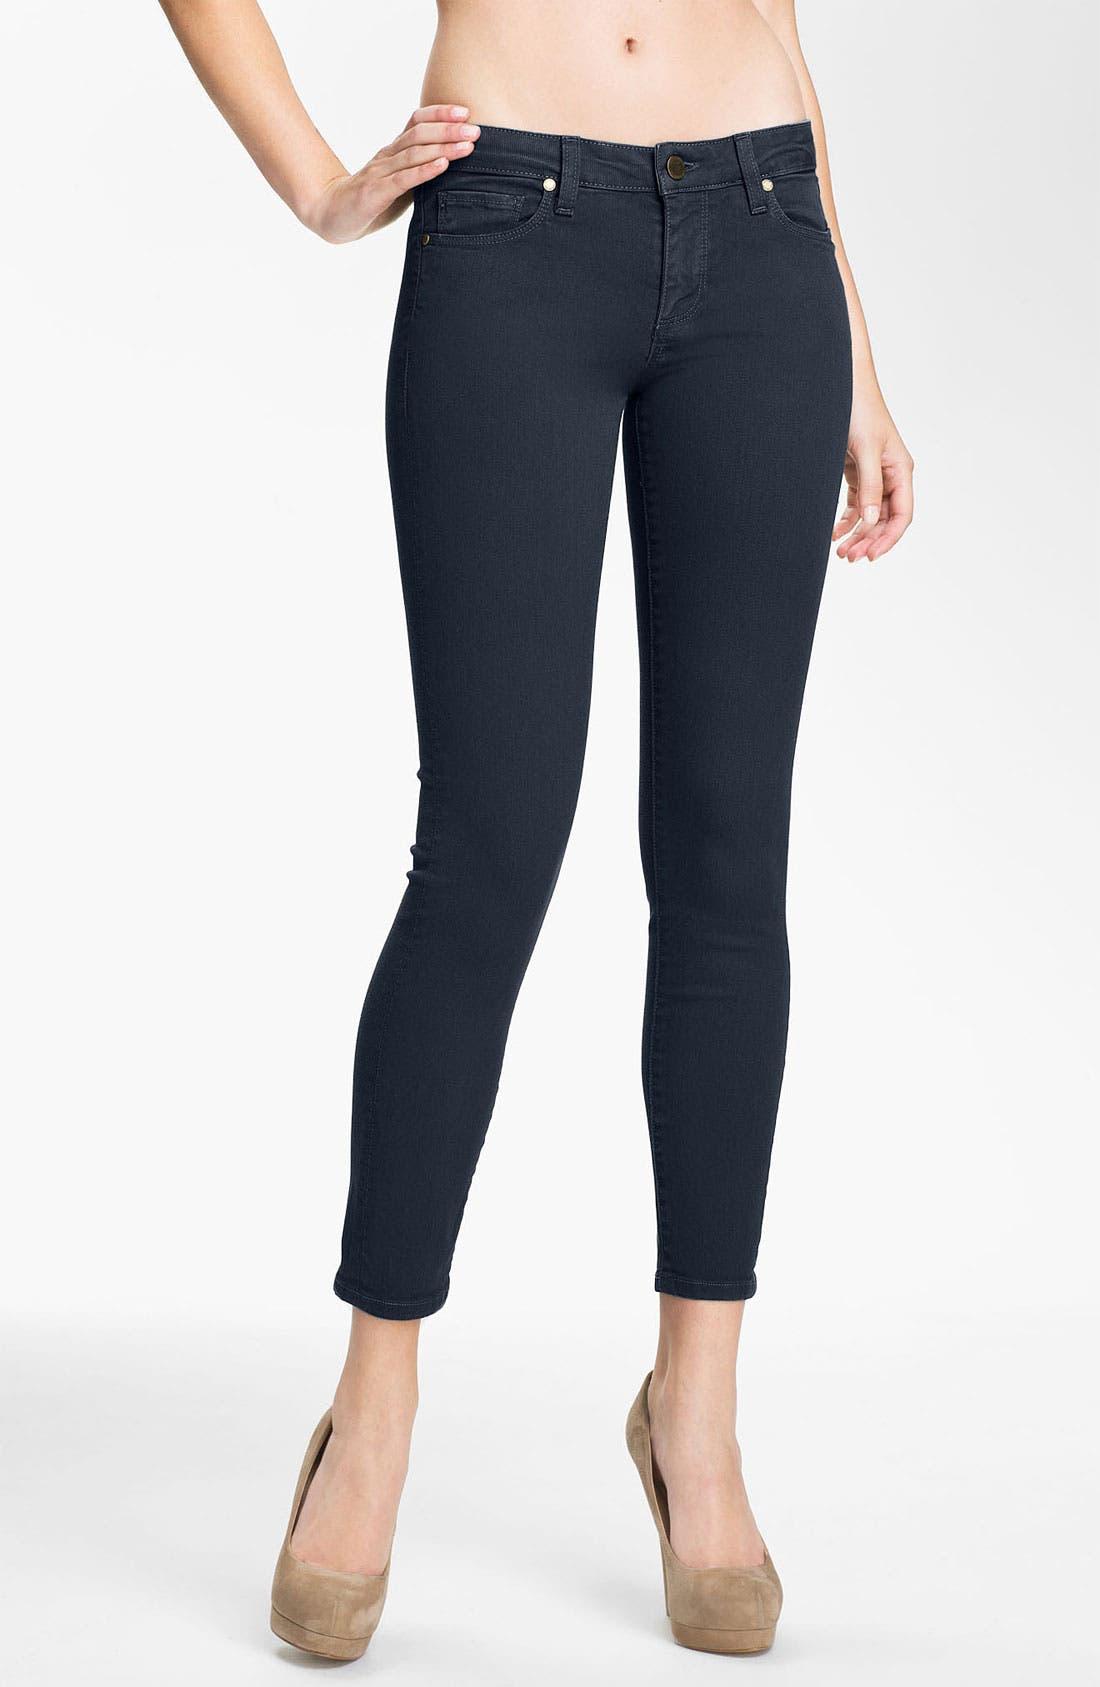 Main Image - Paige Denim 'Skyline' Ankle Peg Skinny Stretch Jeans (Drift)